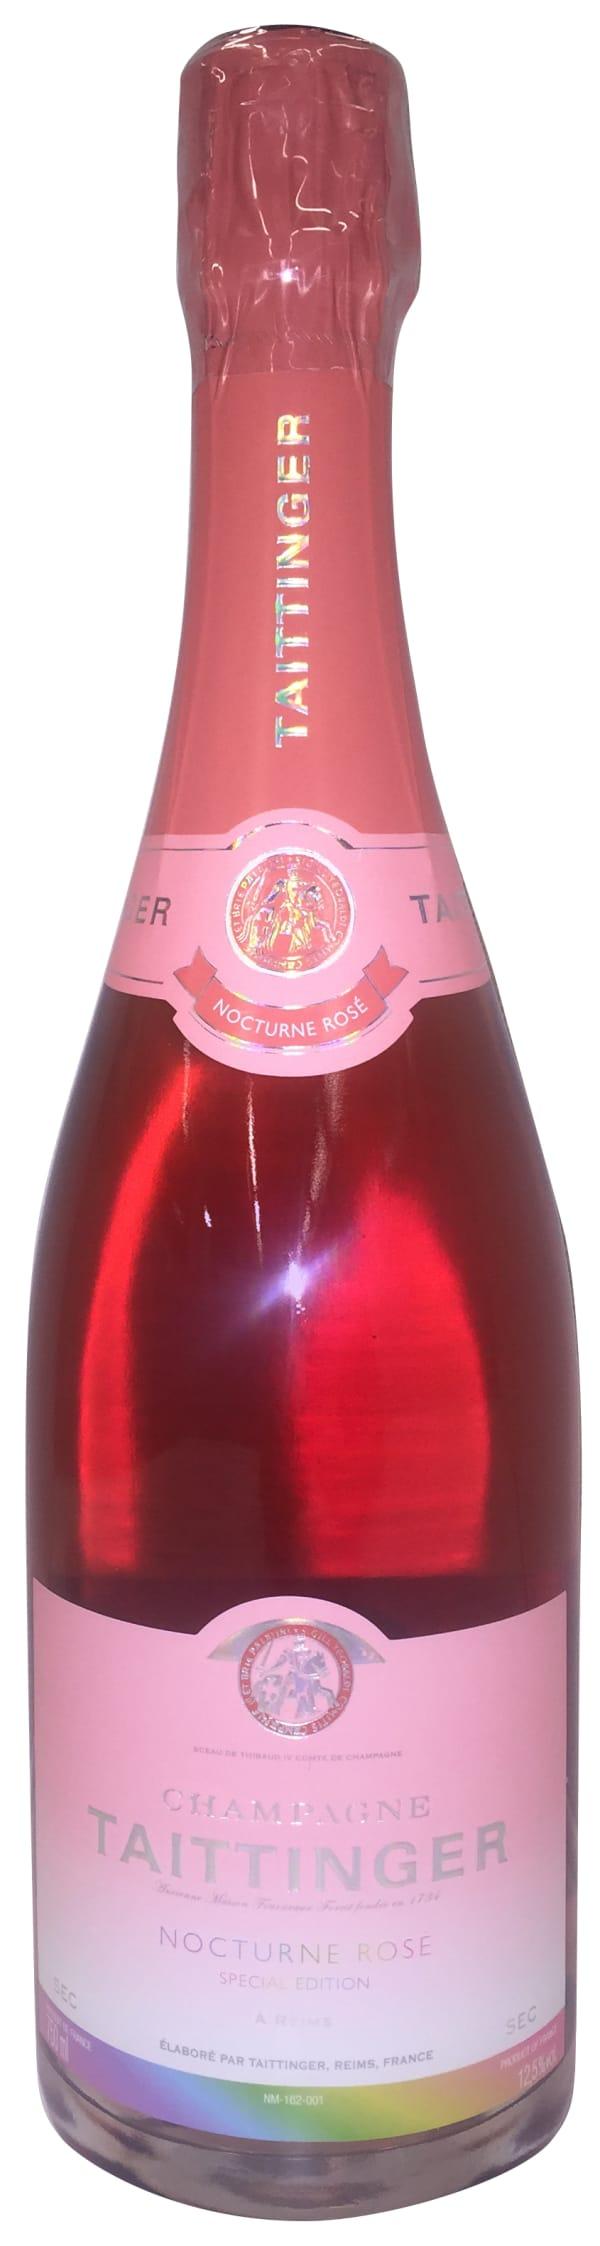 Taittinger Nocturne Special Edition Rosé Champagne Sec